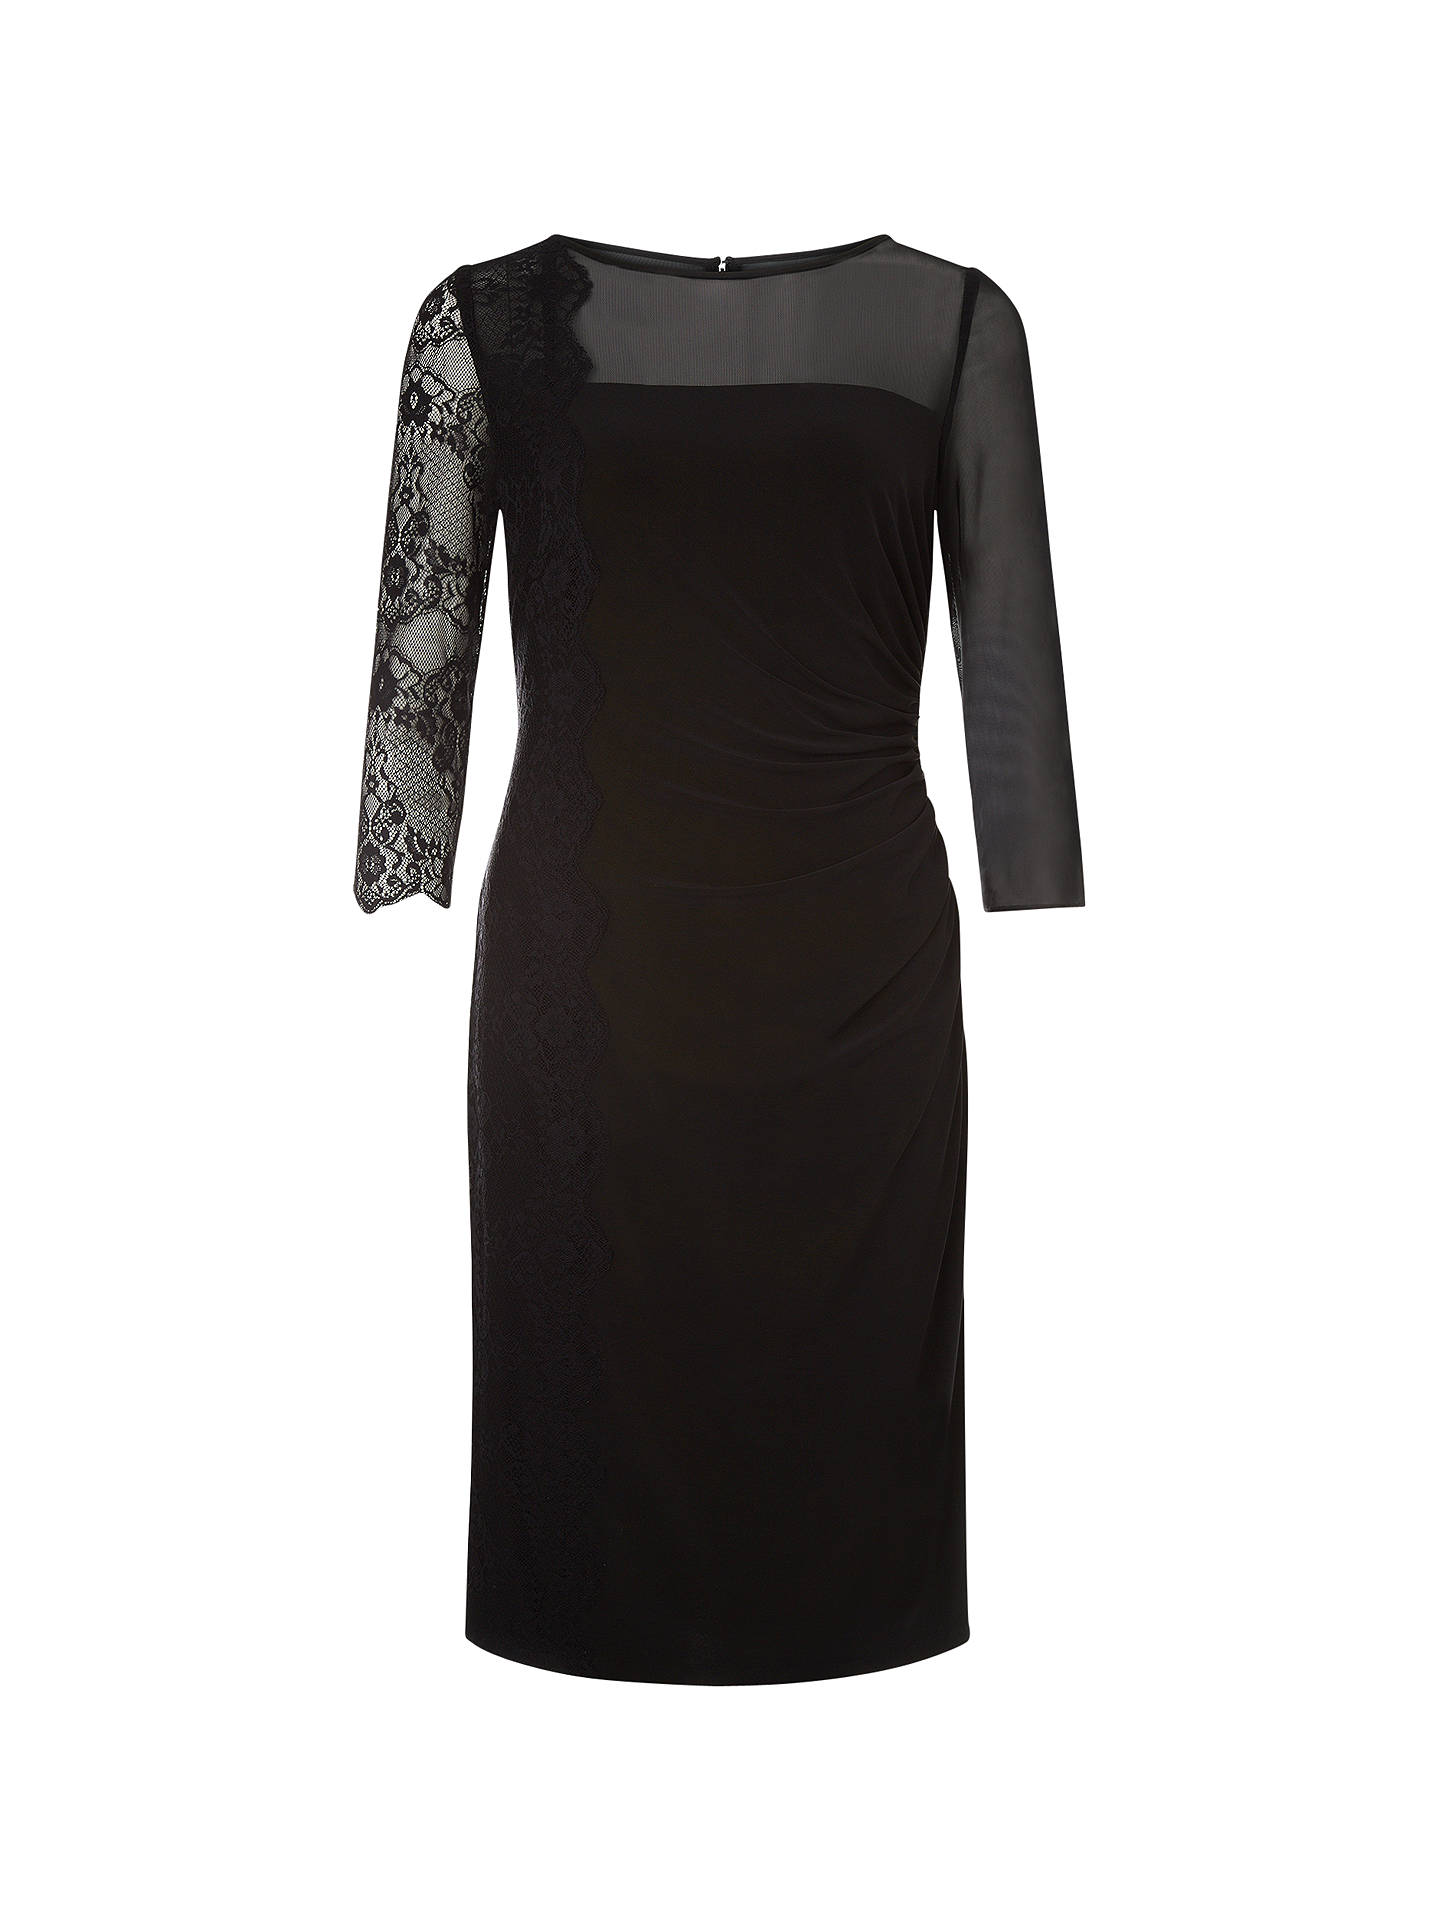 90a9049689a Buy Kaliko Lace Panel Jersey Dress, Black, 8 Online at johnlewis.com ...